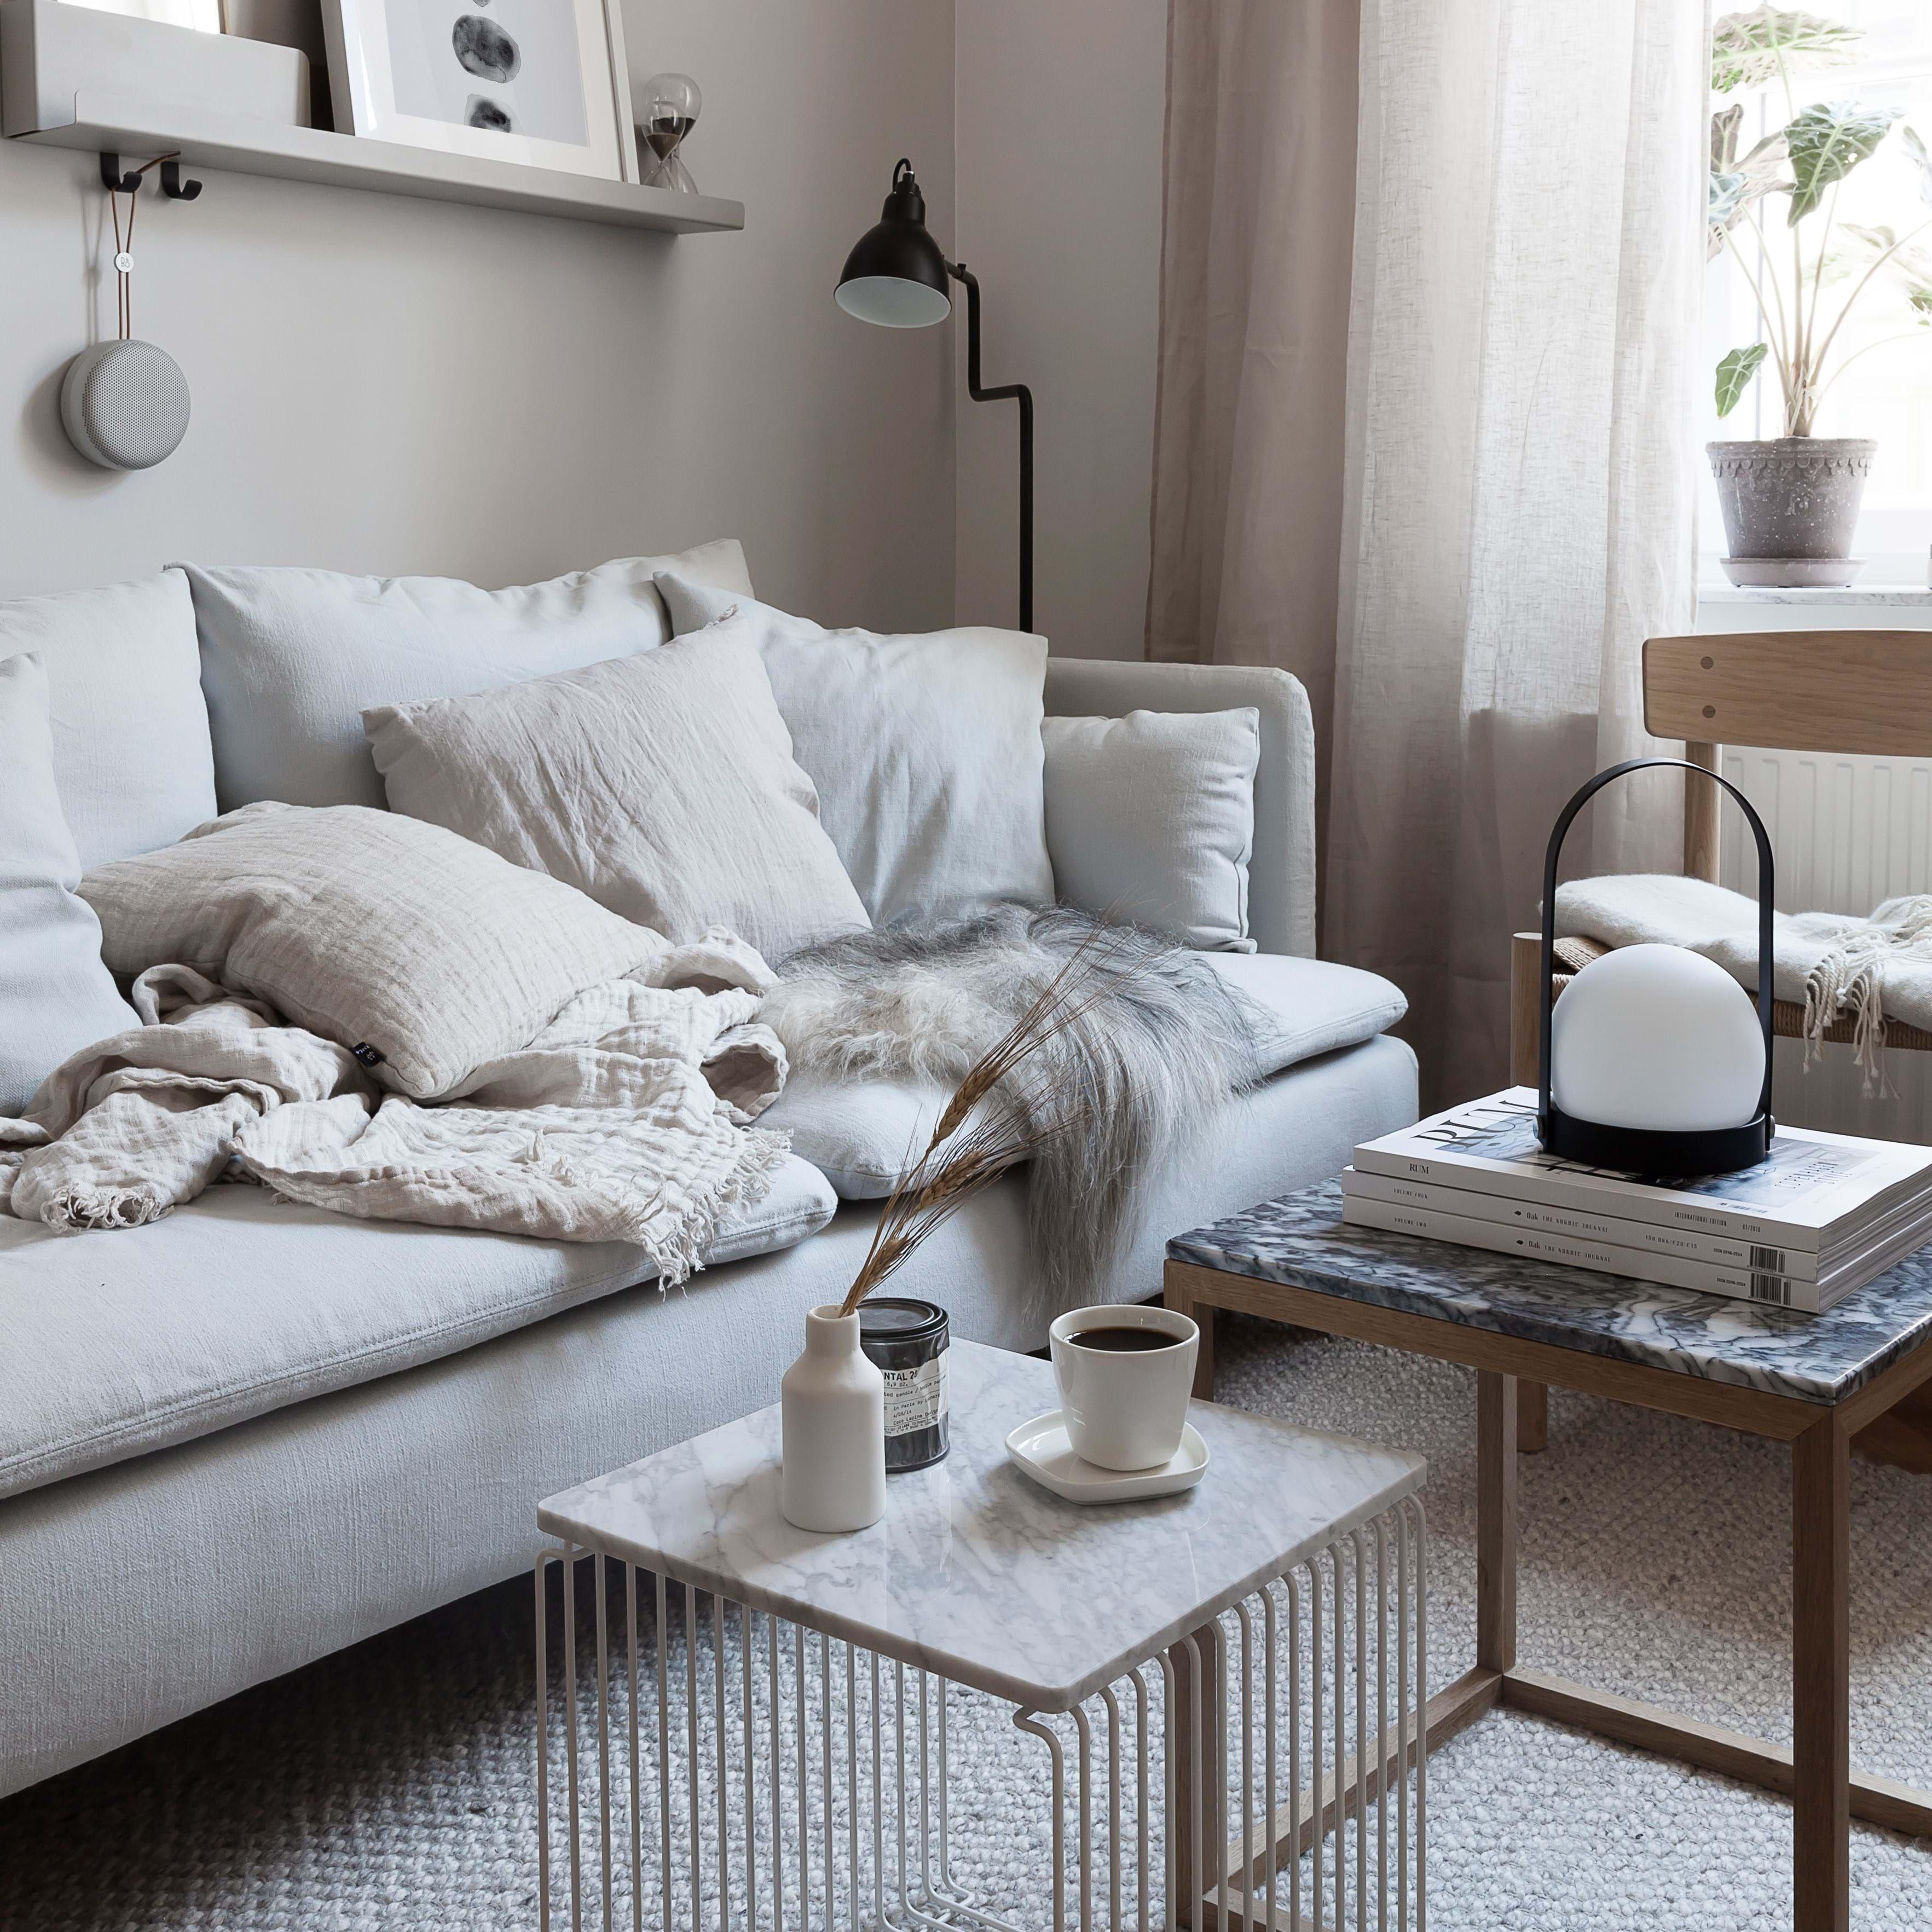 Coco Lapine Design S Ikea Soderhamn Sofa Style Makeover Bemz